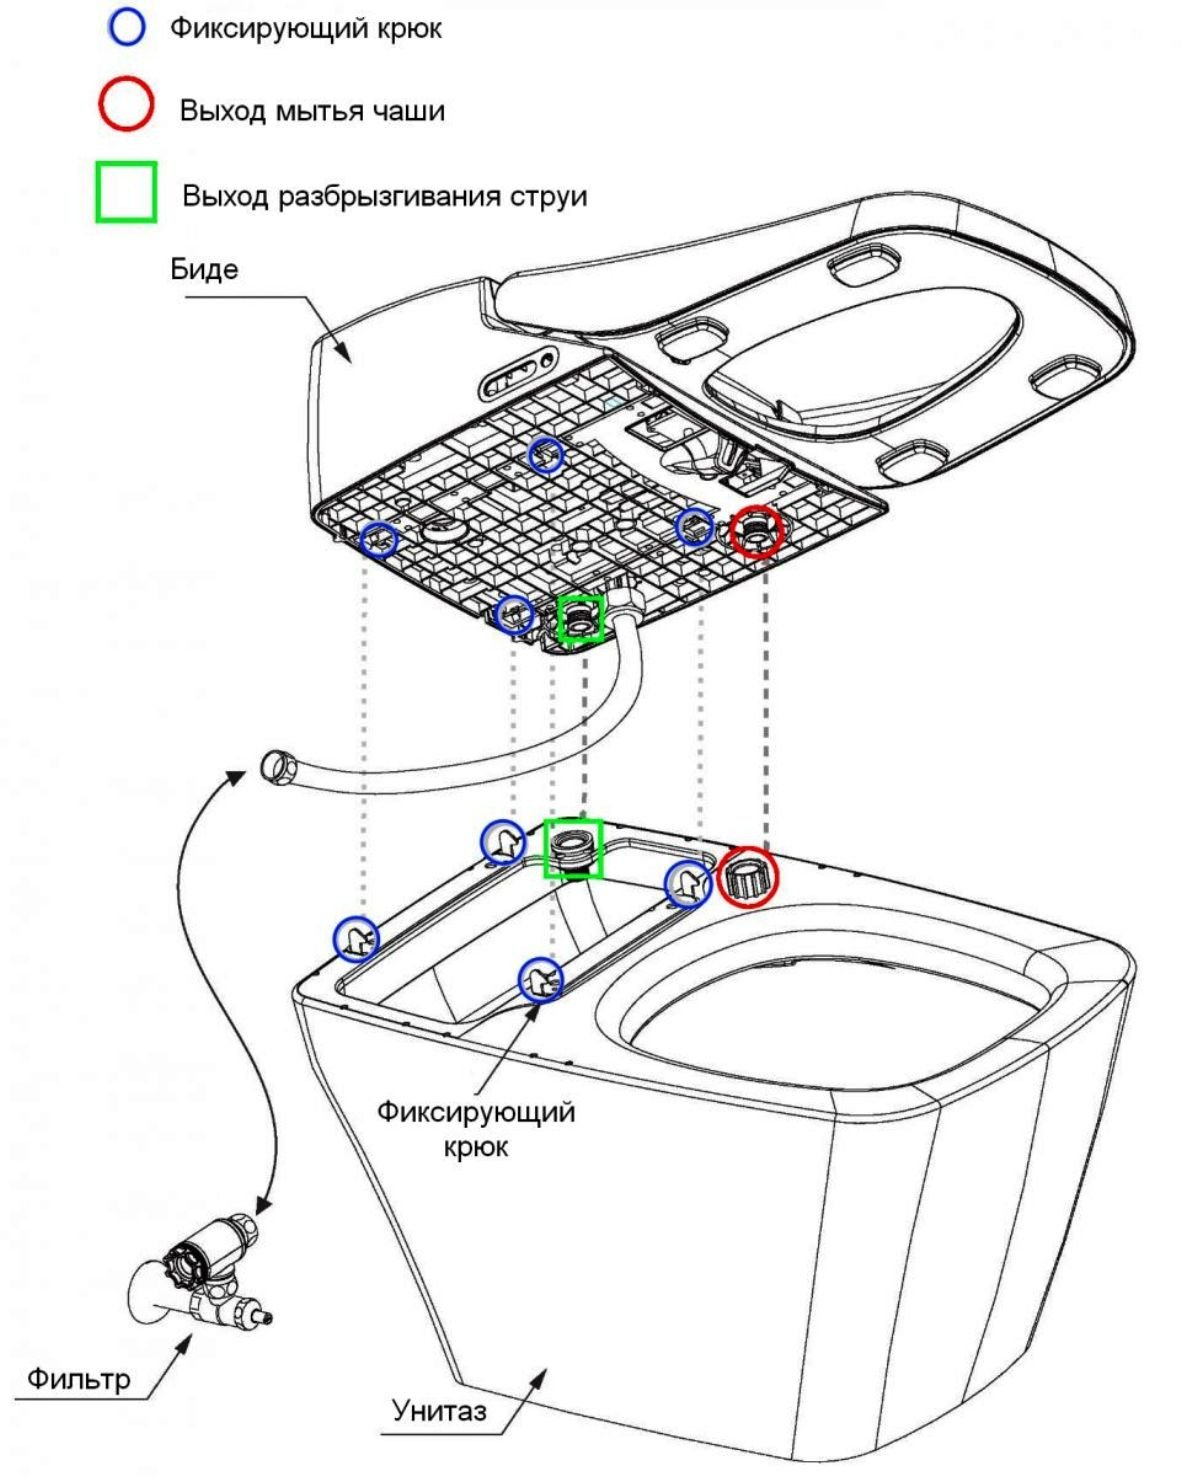 схема устройства крышки-биде